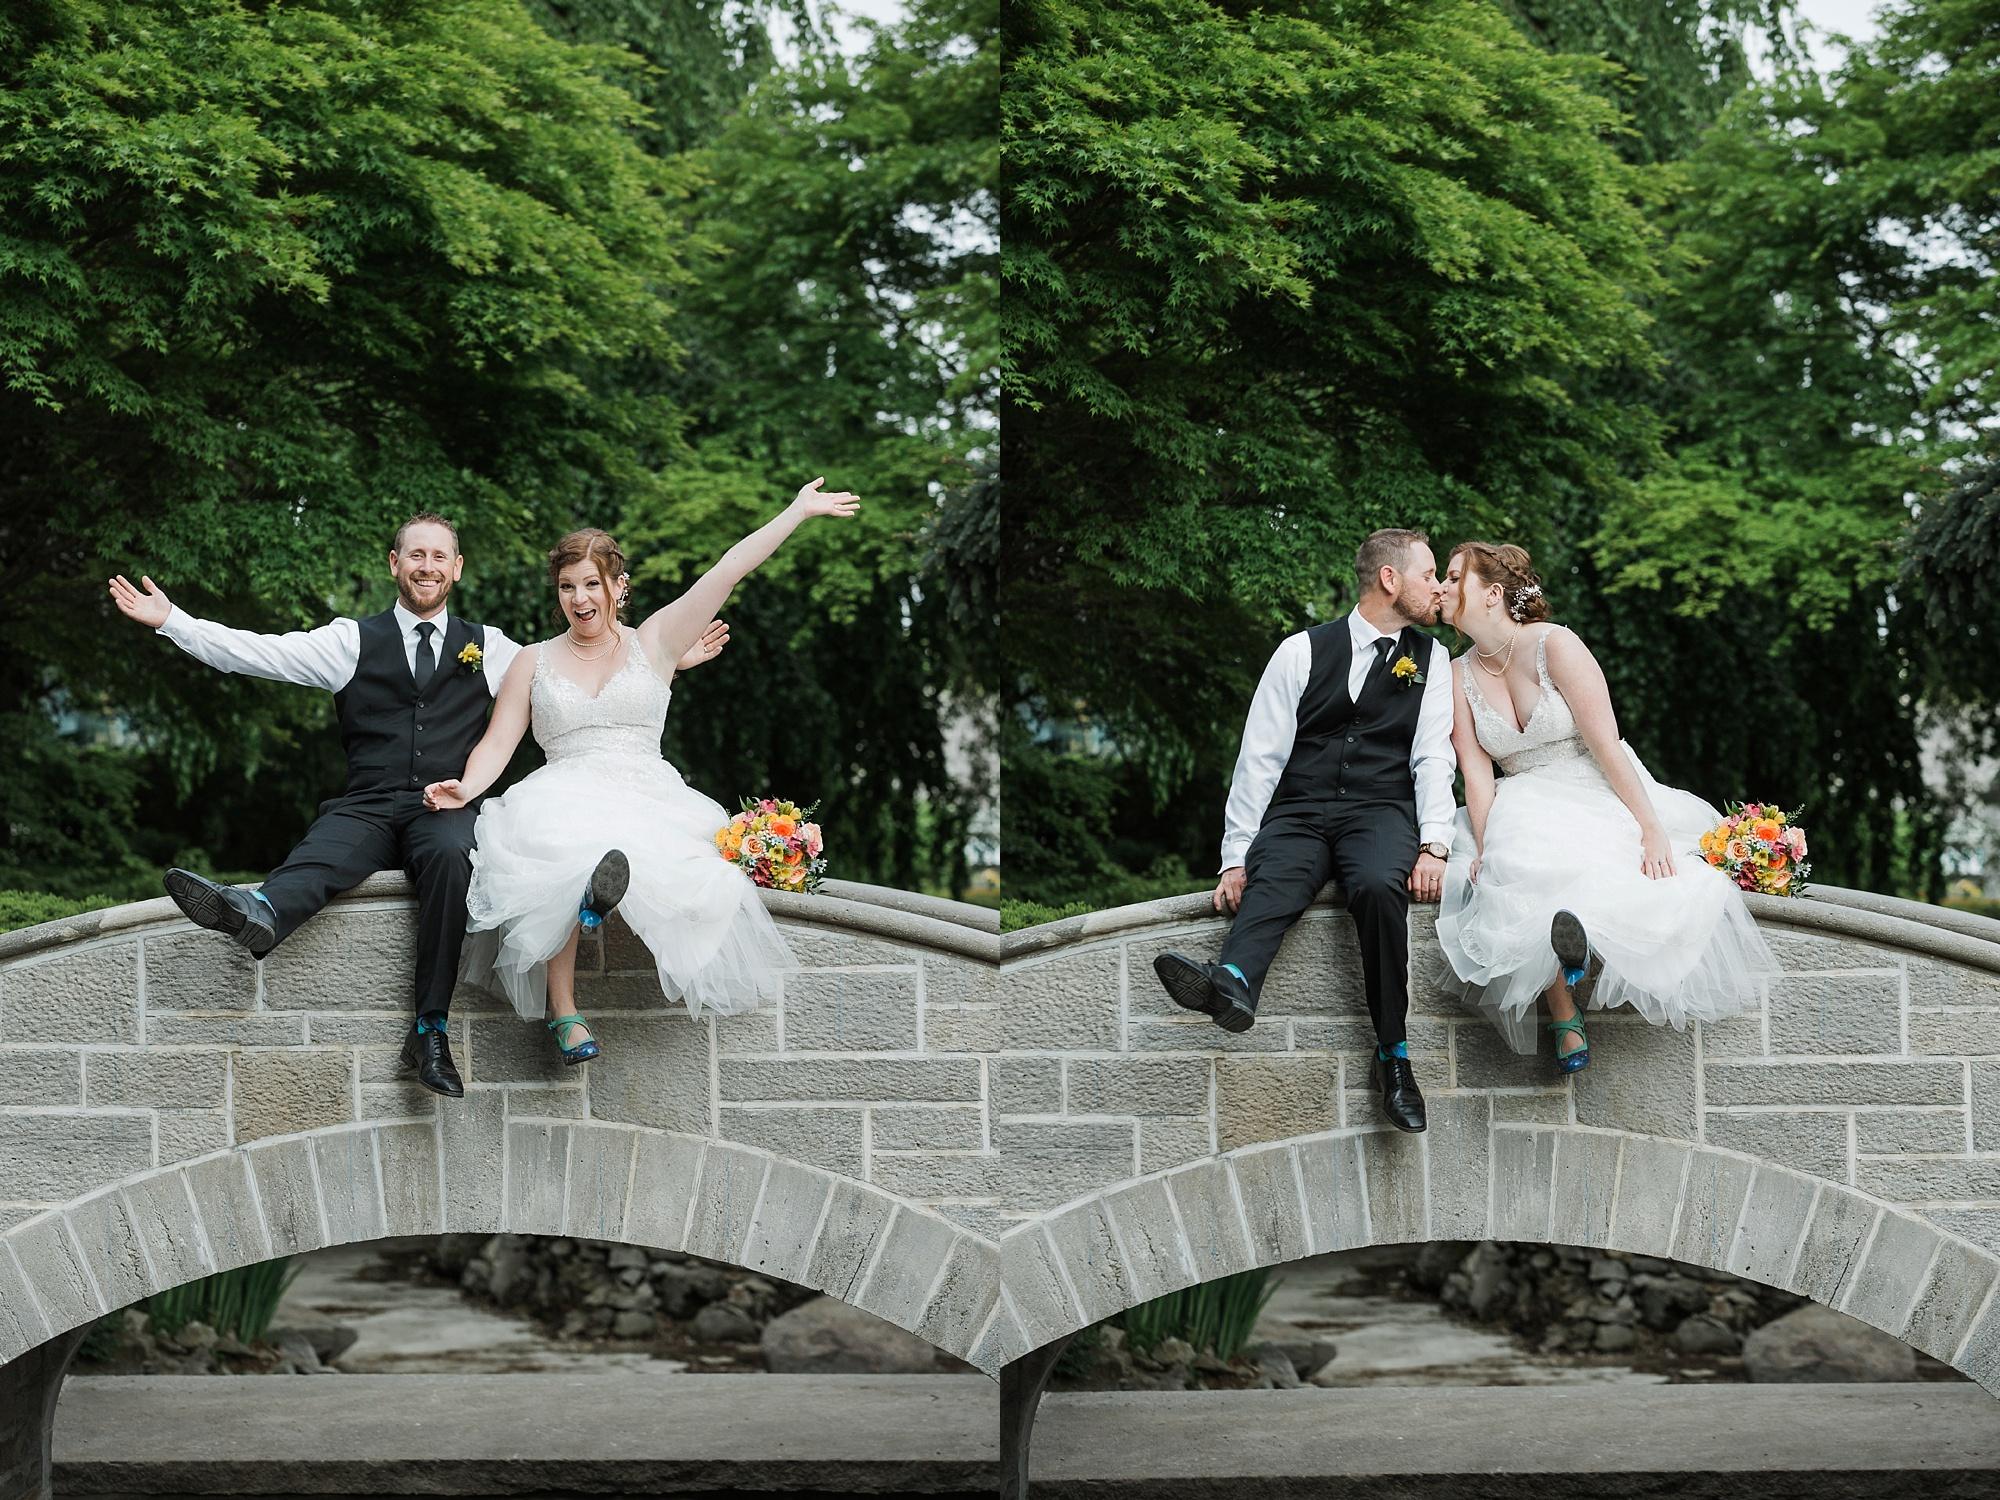 niagarafalls-weddingphotography_0042.jpg